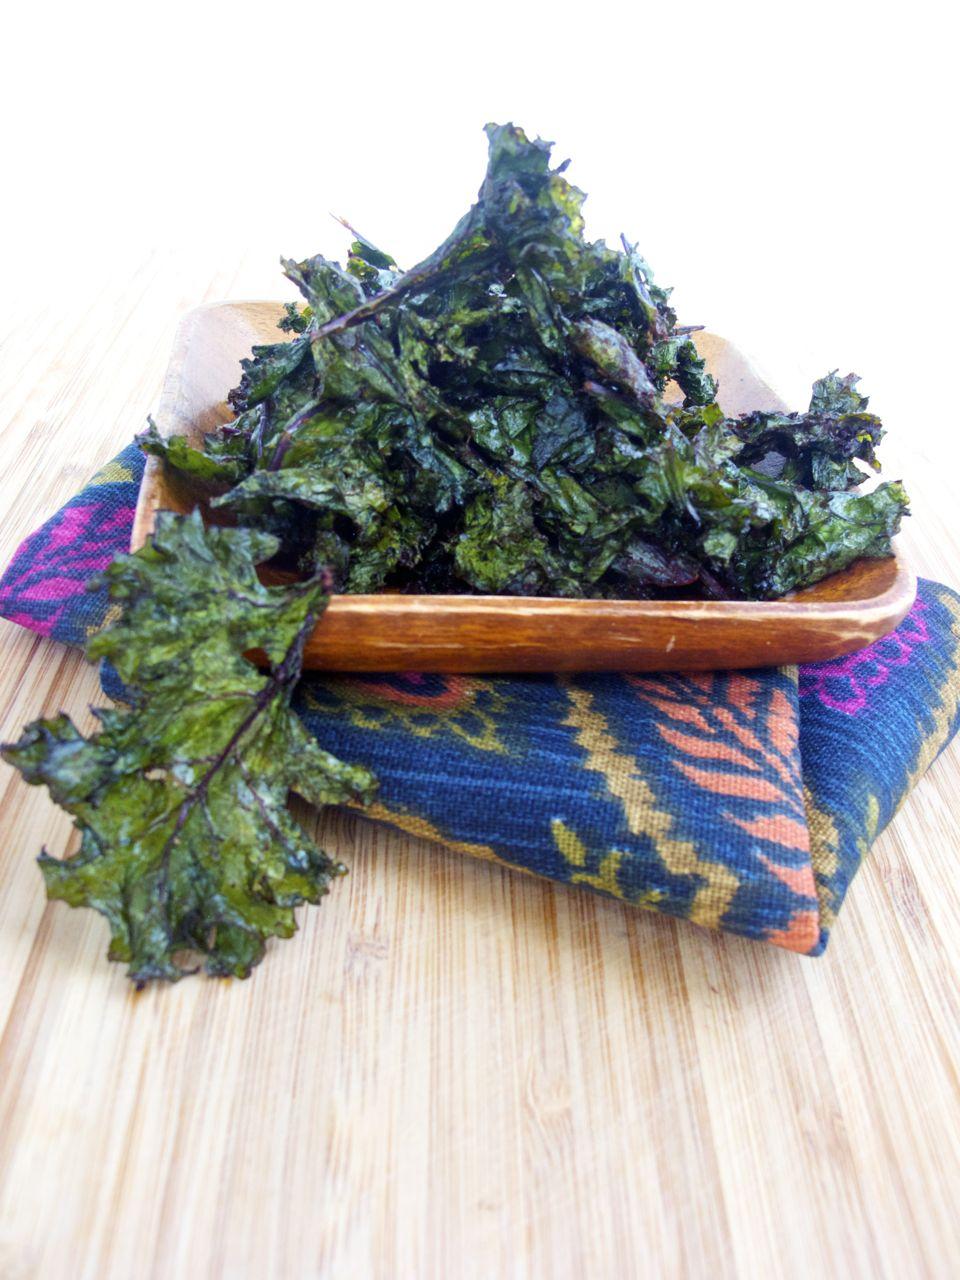 Kale and chipotle chips. Kale al horno con chipotle.